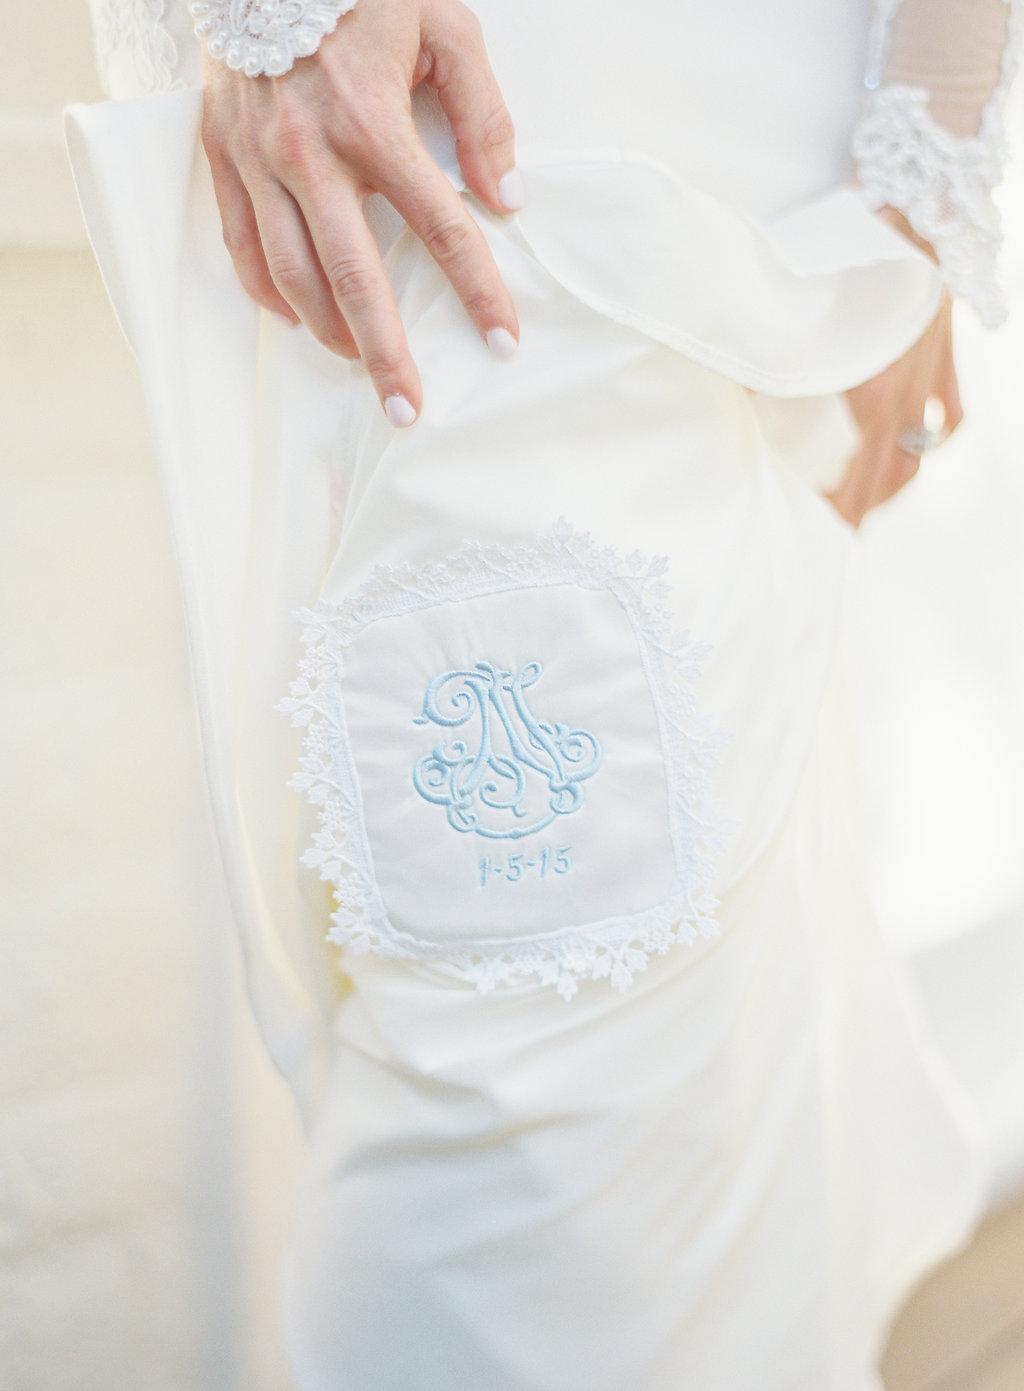 San Ysidro Ranch Wedding | Cody Floral Design | Santa Barbara Wedding Florist | Photography by The Great Romance